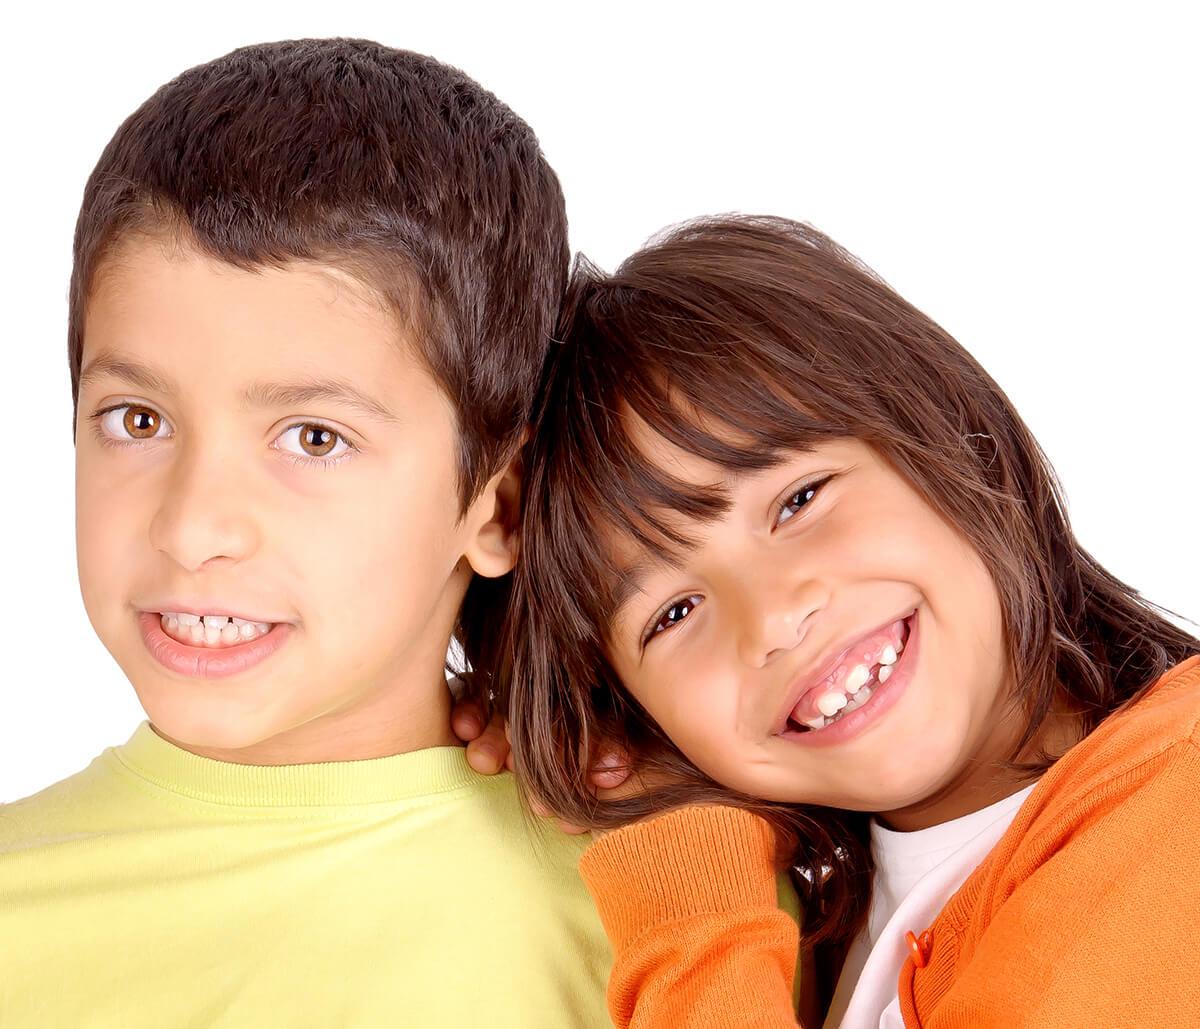 Looking for a Pediatric Dentist in Greensboro, NC Area, Visit Dr. Sona Isharani at Triad Pediatric Dentistry